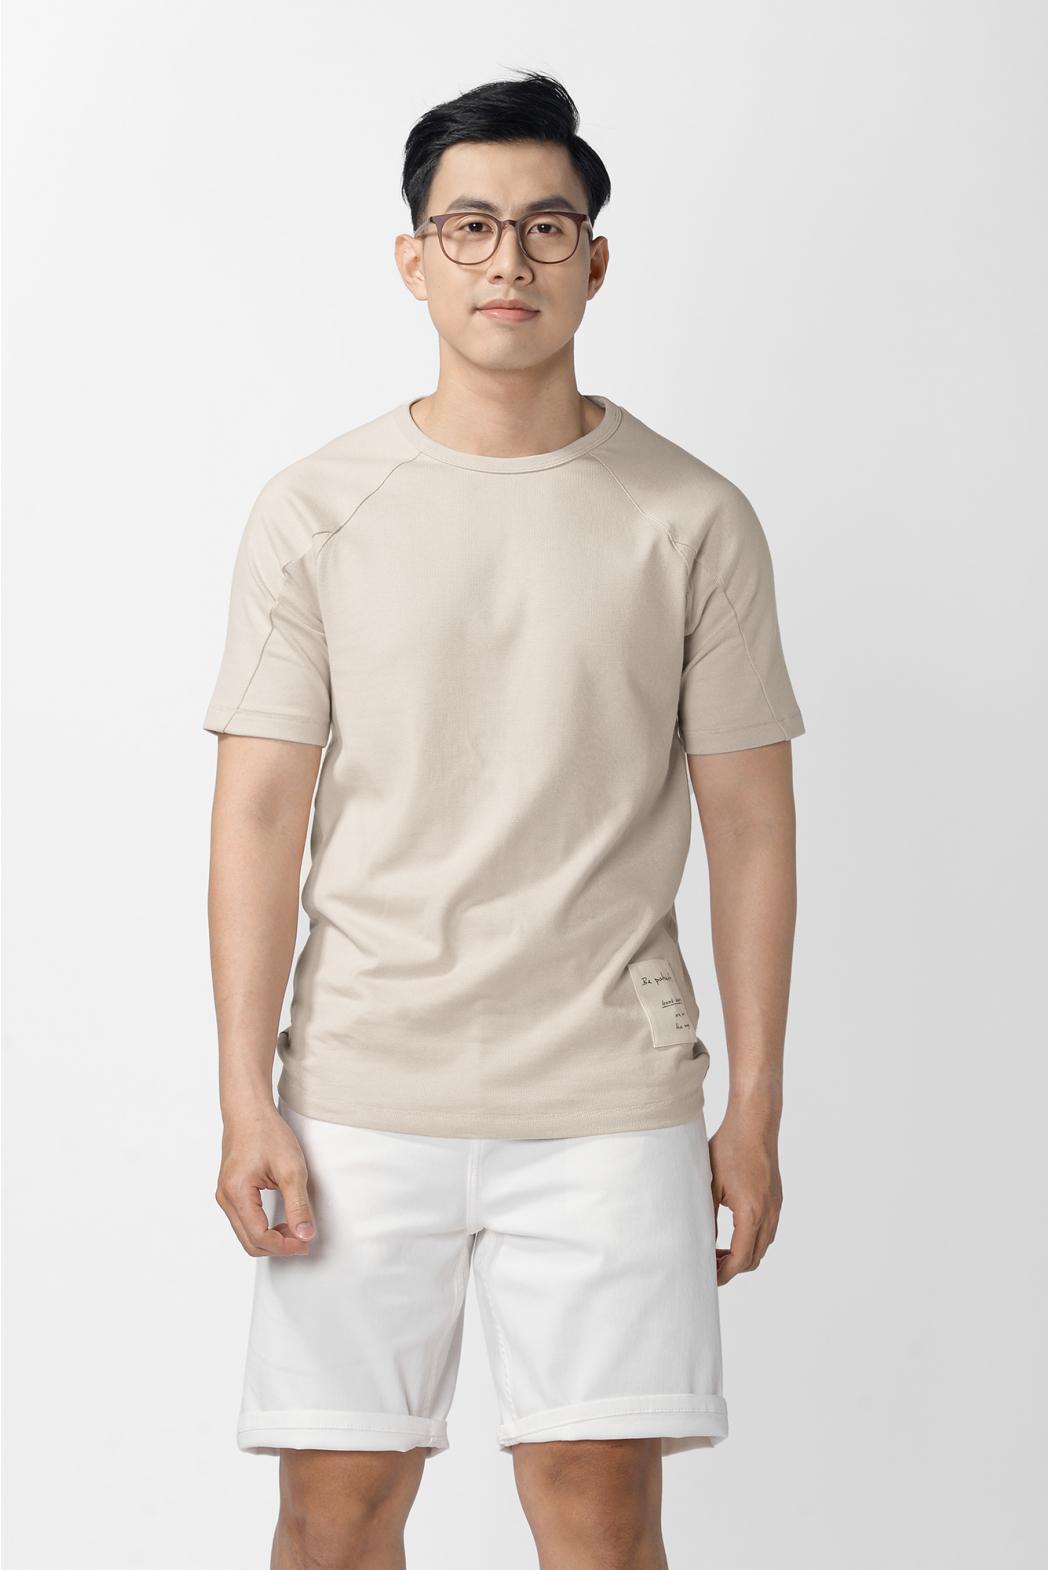 Áo thun tay ngắn, raglane. REGULAR form - 10F20TSH041